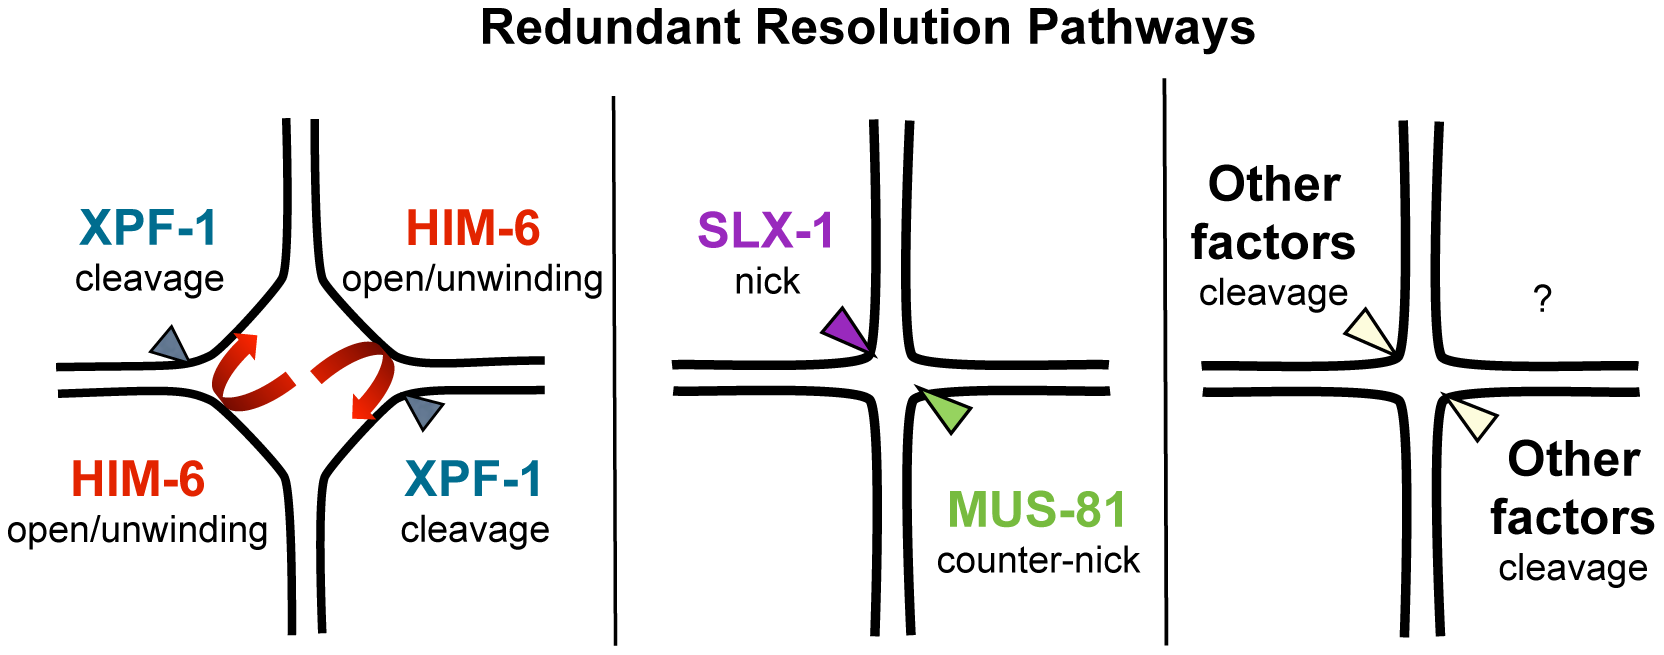 Model of redundant resolution pathways.